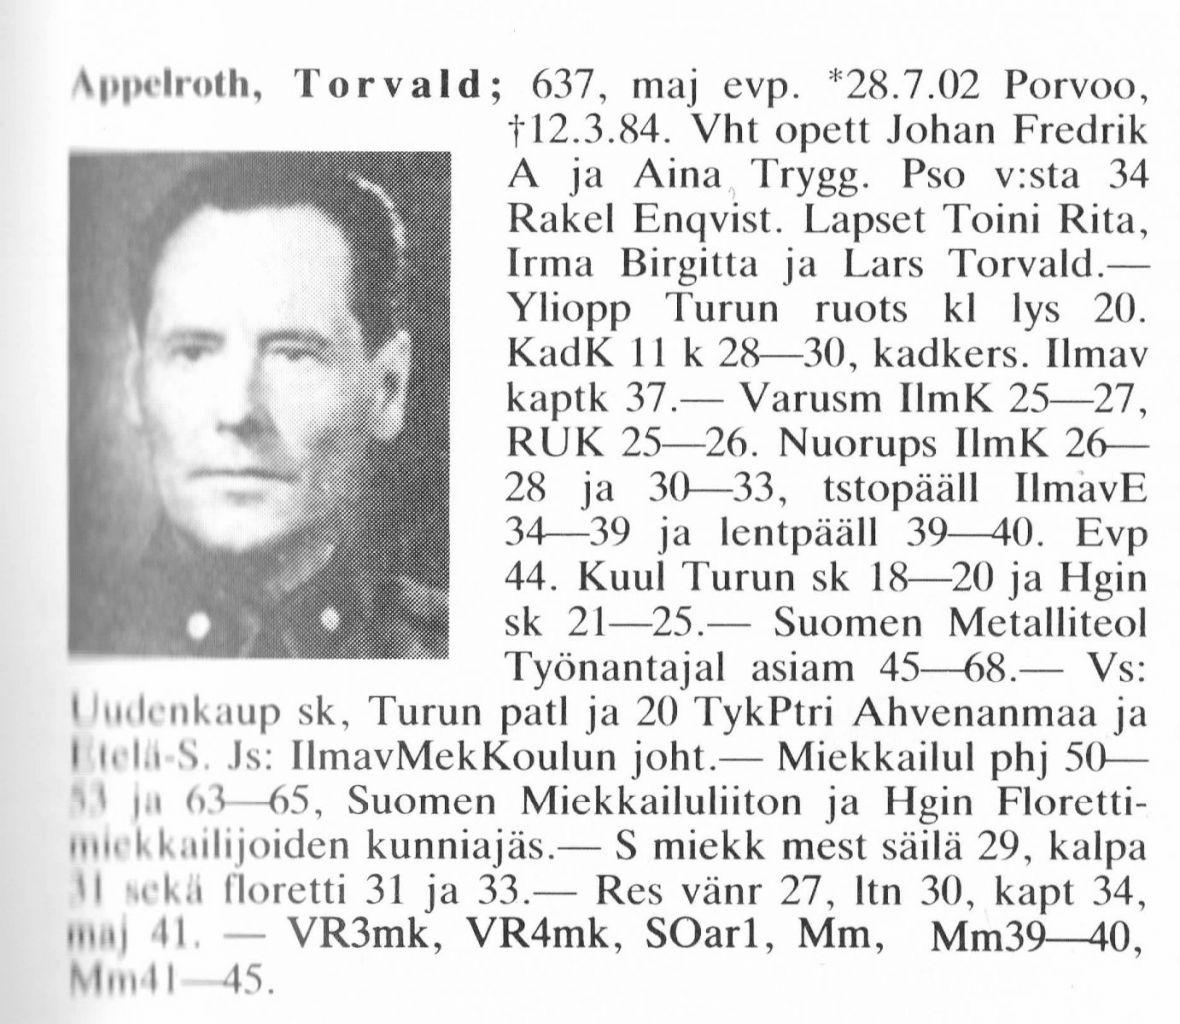 5fc11888328c2_TorvaldAppelroth.thumb.jpeg.a4381d2538e080aef16e33da881709b3.jpeg